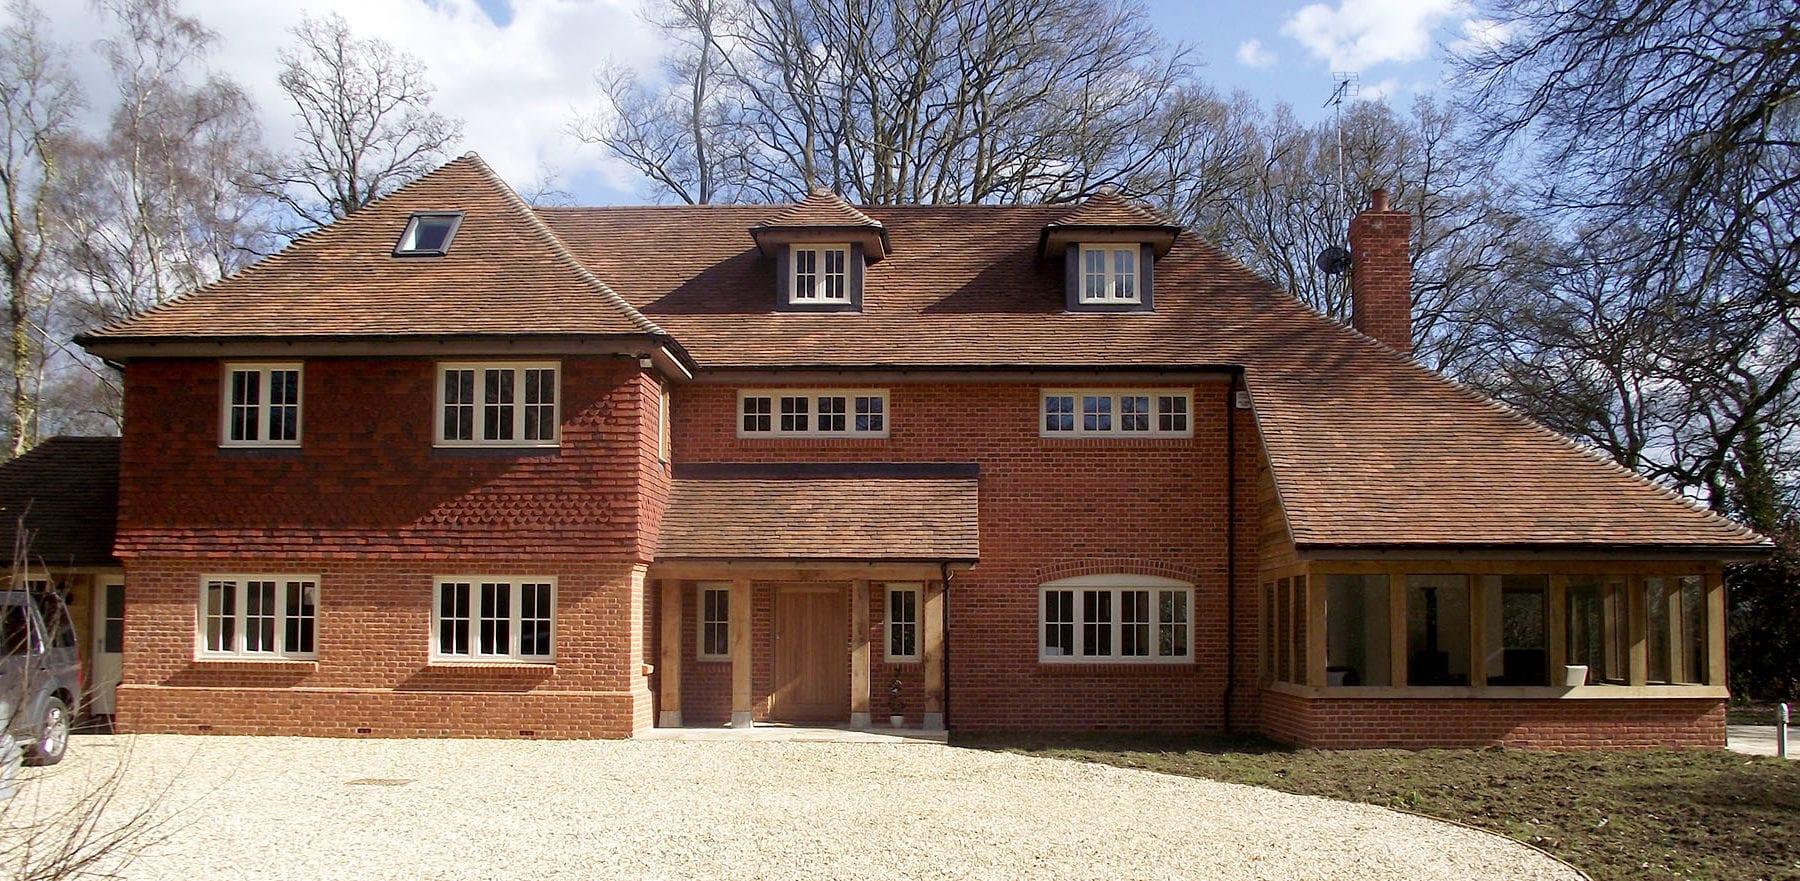 Lifestiles - Handmade Brown Clay Roof Tiles - Romsey, England 2